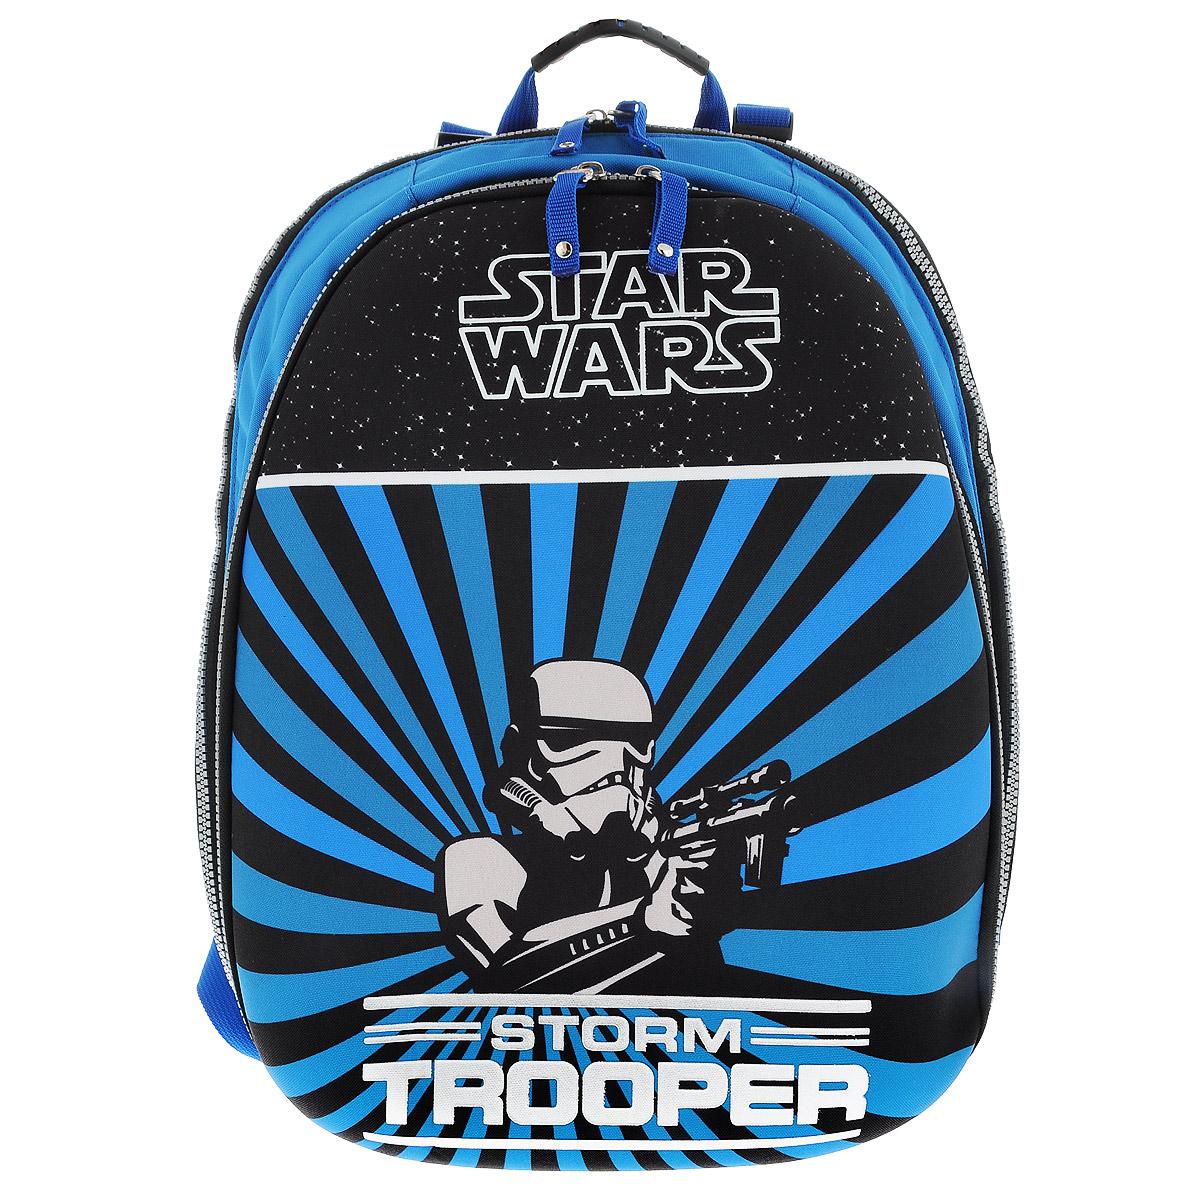 Рюкзак Star Wars  Storm Trooper , цвет: синий, черный. 37474_Storm Trooper -  Ранцы и рюкзаки